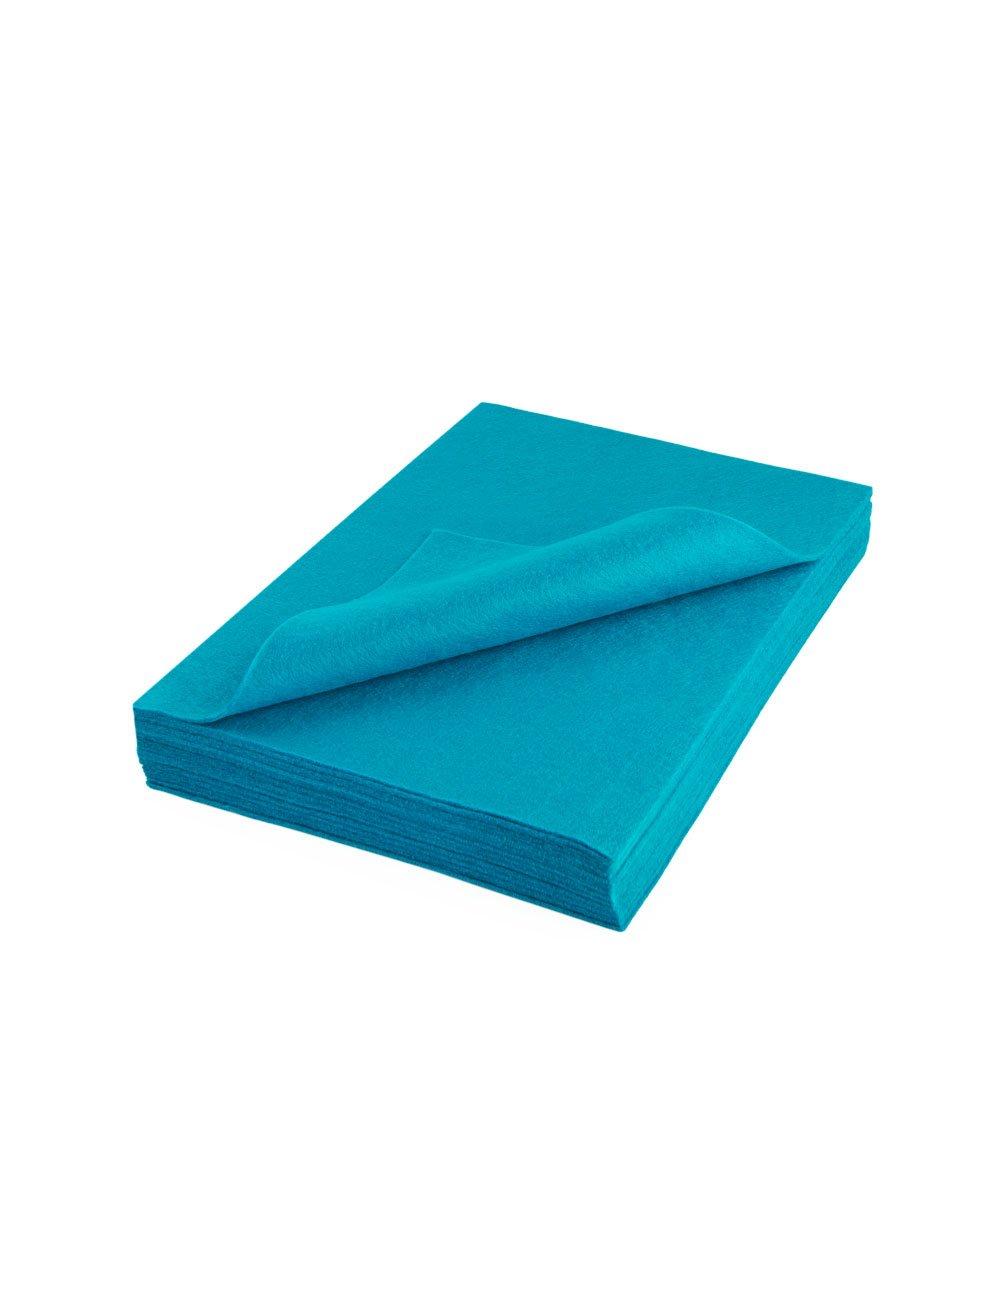 "High Quality Acrylic Felt Sheet 9"" X 12"": 25 PCS, Turquoise The Felt Store"